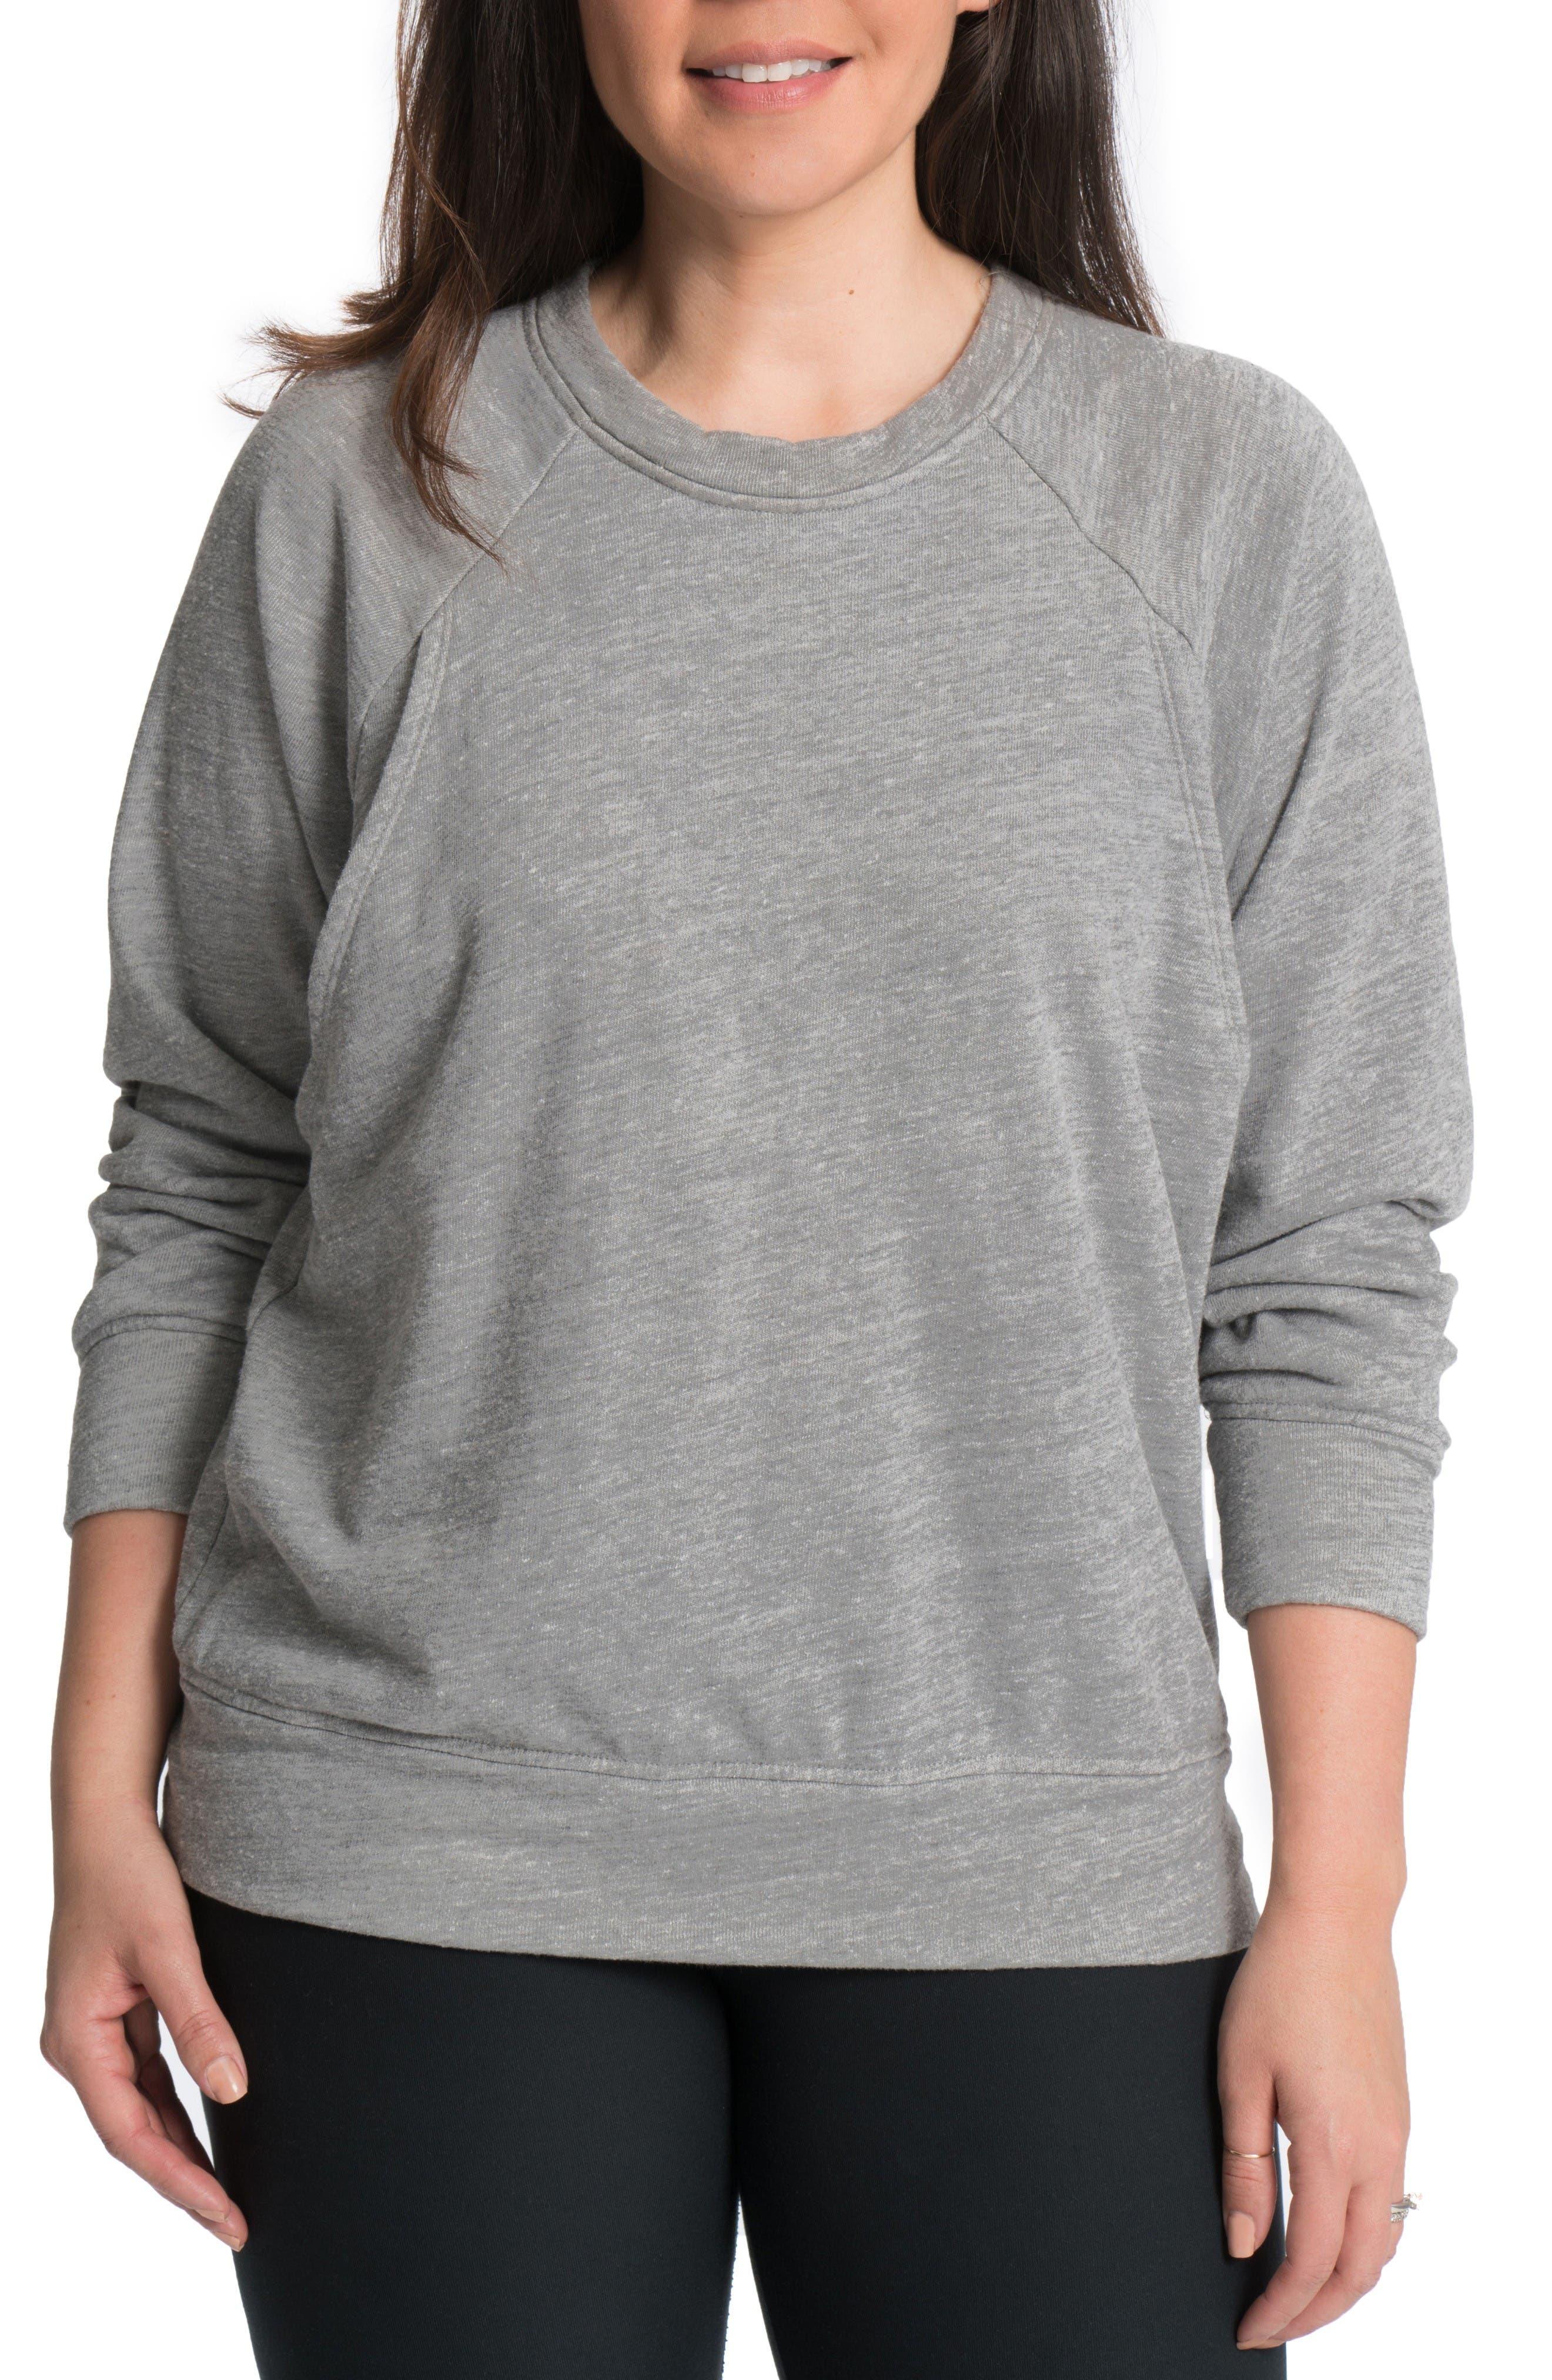 Alternate Image 1 Selected - Bun Maternity Relaxed Daily Maternity/Nursing Sweatshirt